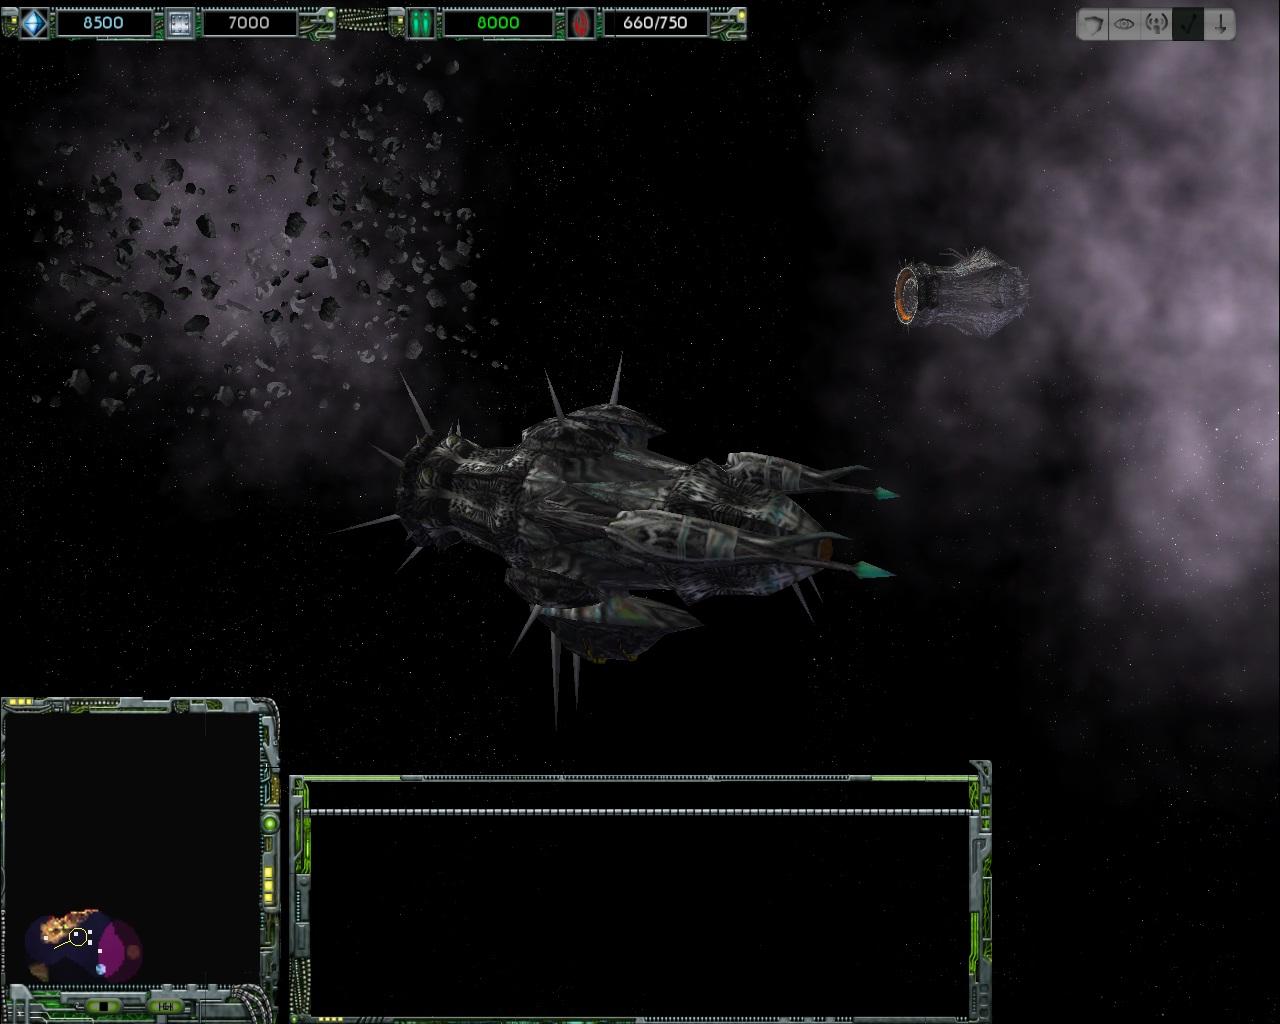 nephilim added to star trek armada 2 mod wing commander cic rh wcnews com star trek armada 3 borg guide star trek armada 3 borg guide